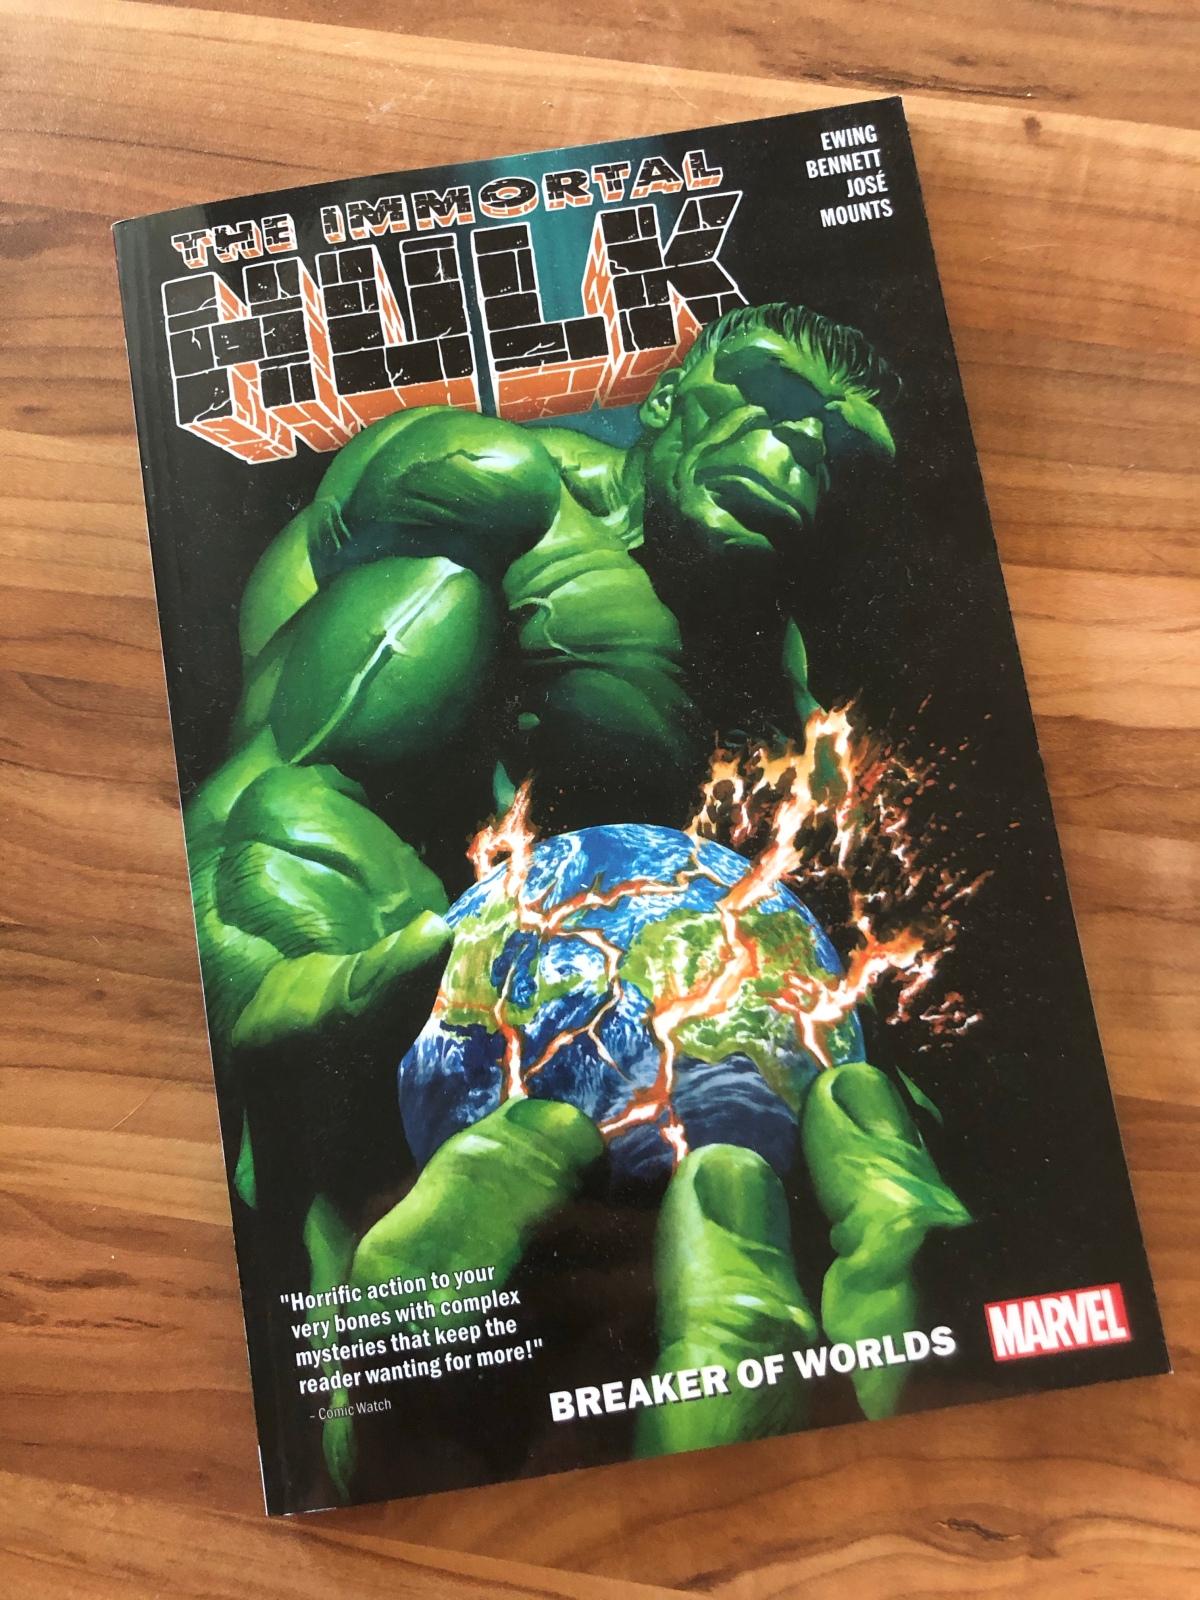 The Immortal Hulk Vol. 5: Breaker of Worlds |Review